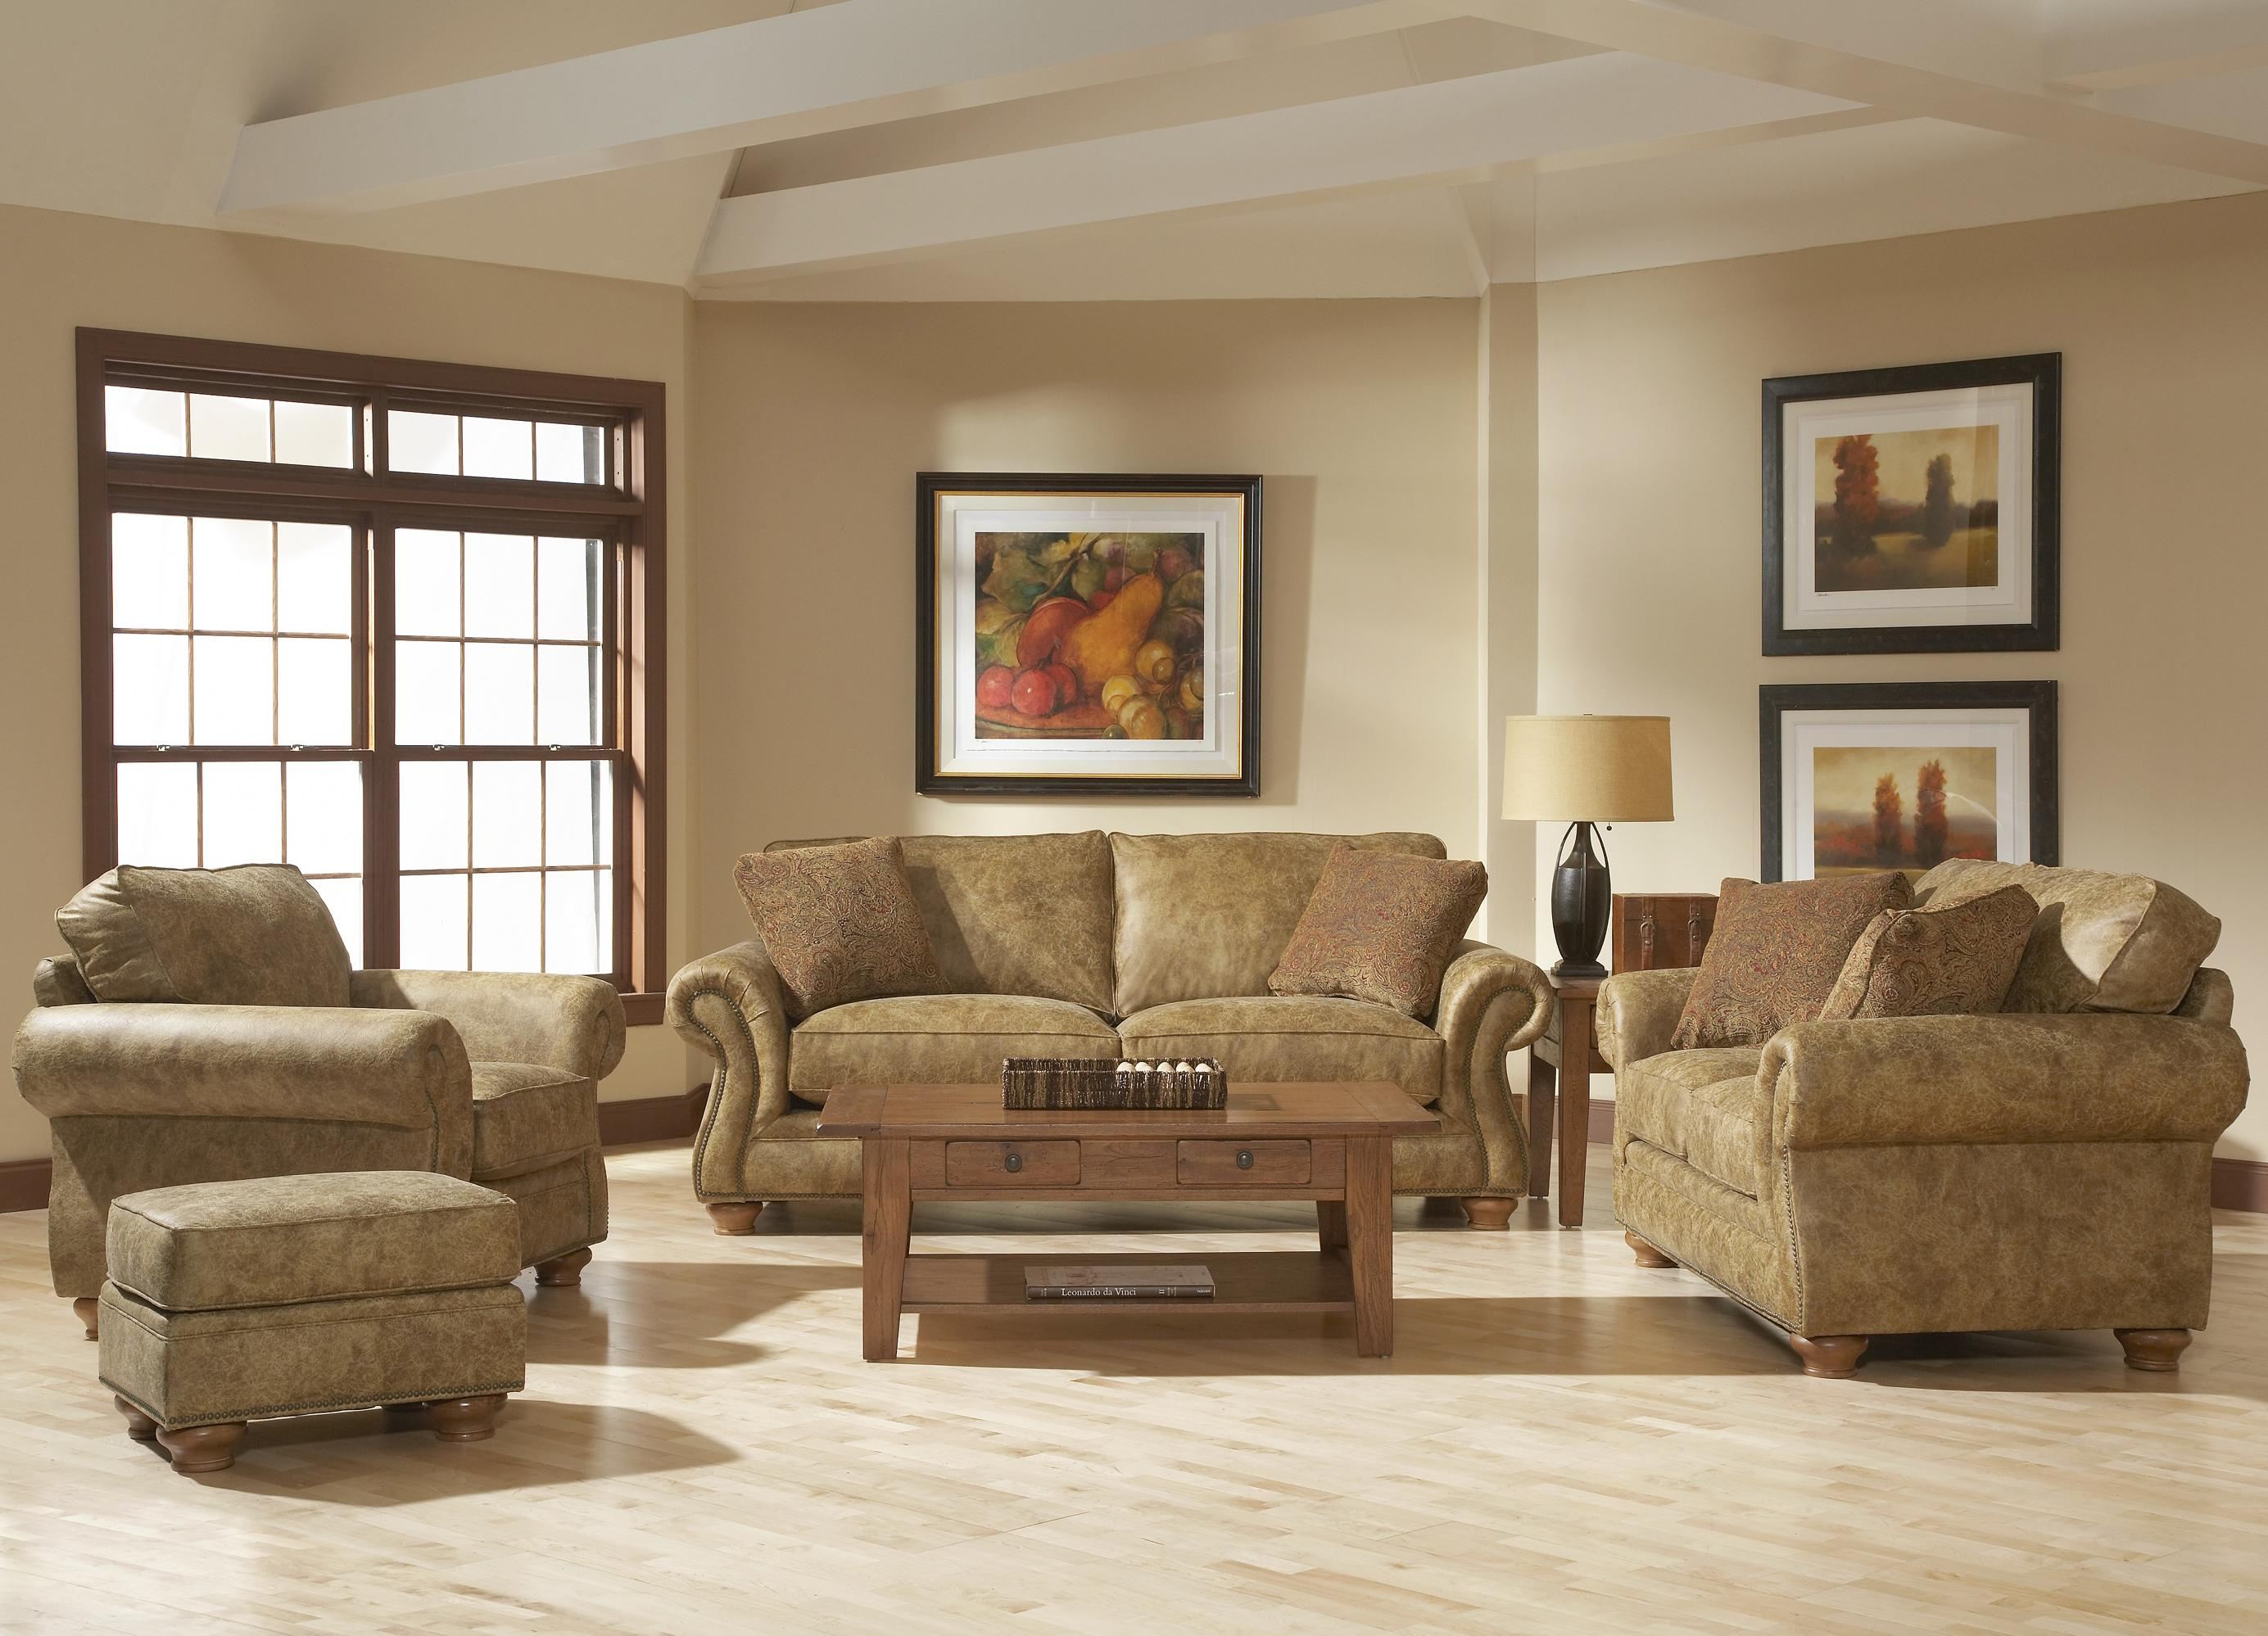 Broyhill Laramie Sofa Images Traditional